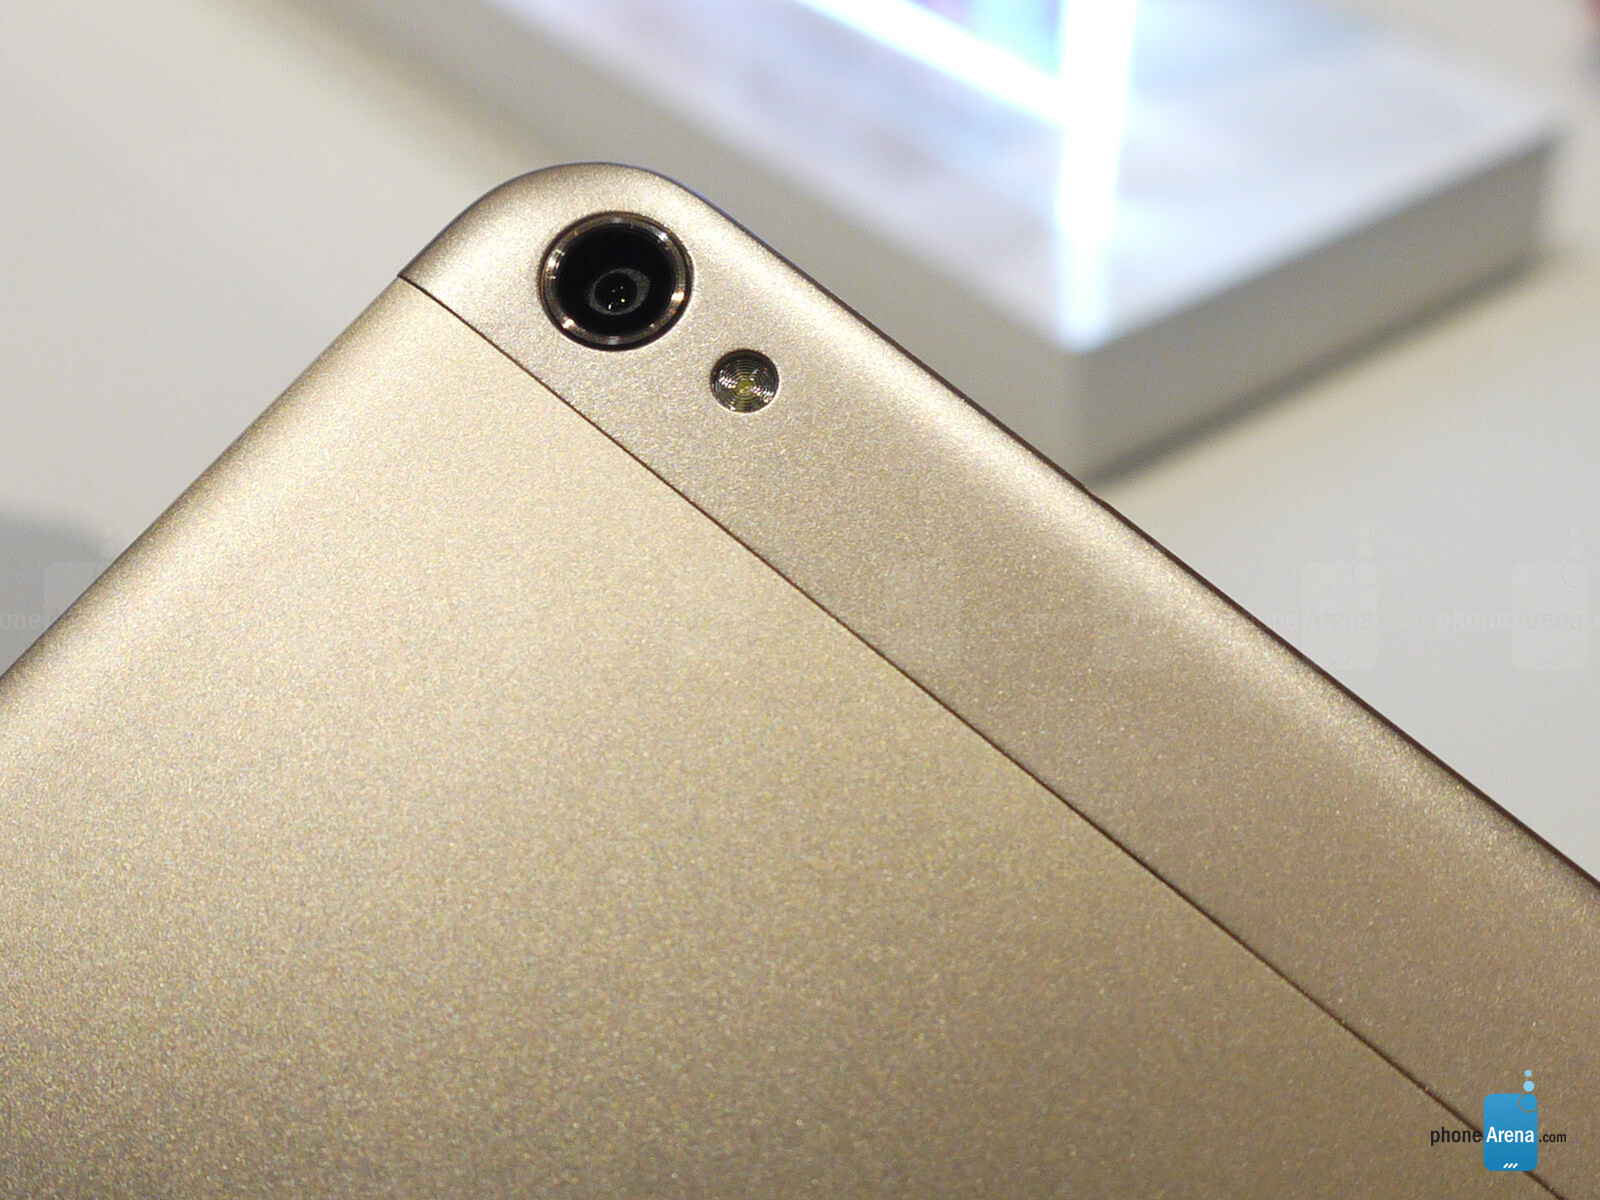 Huawei MediaPad X2 hands-on / IT news / Блоги о